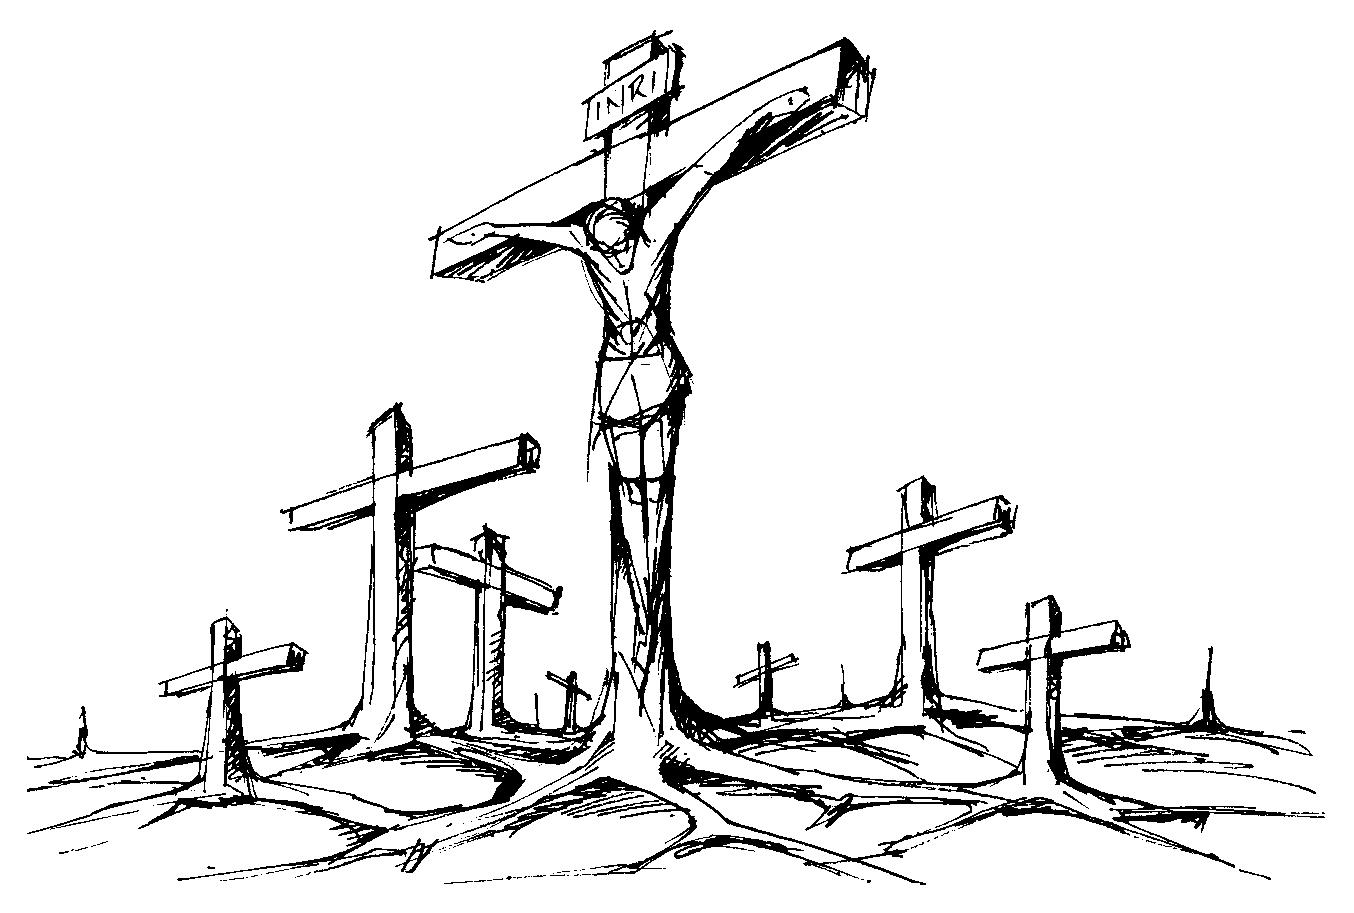 Free Lent Graphics, Download Free Lent Graphics png images